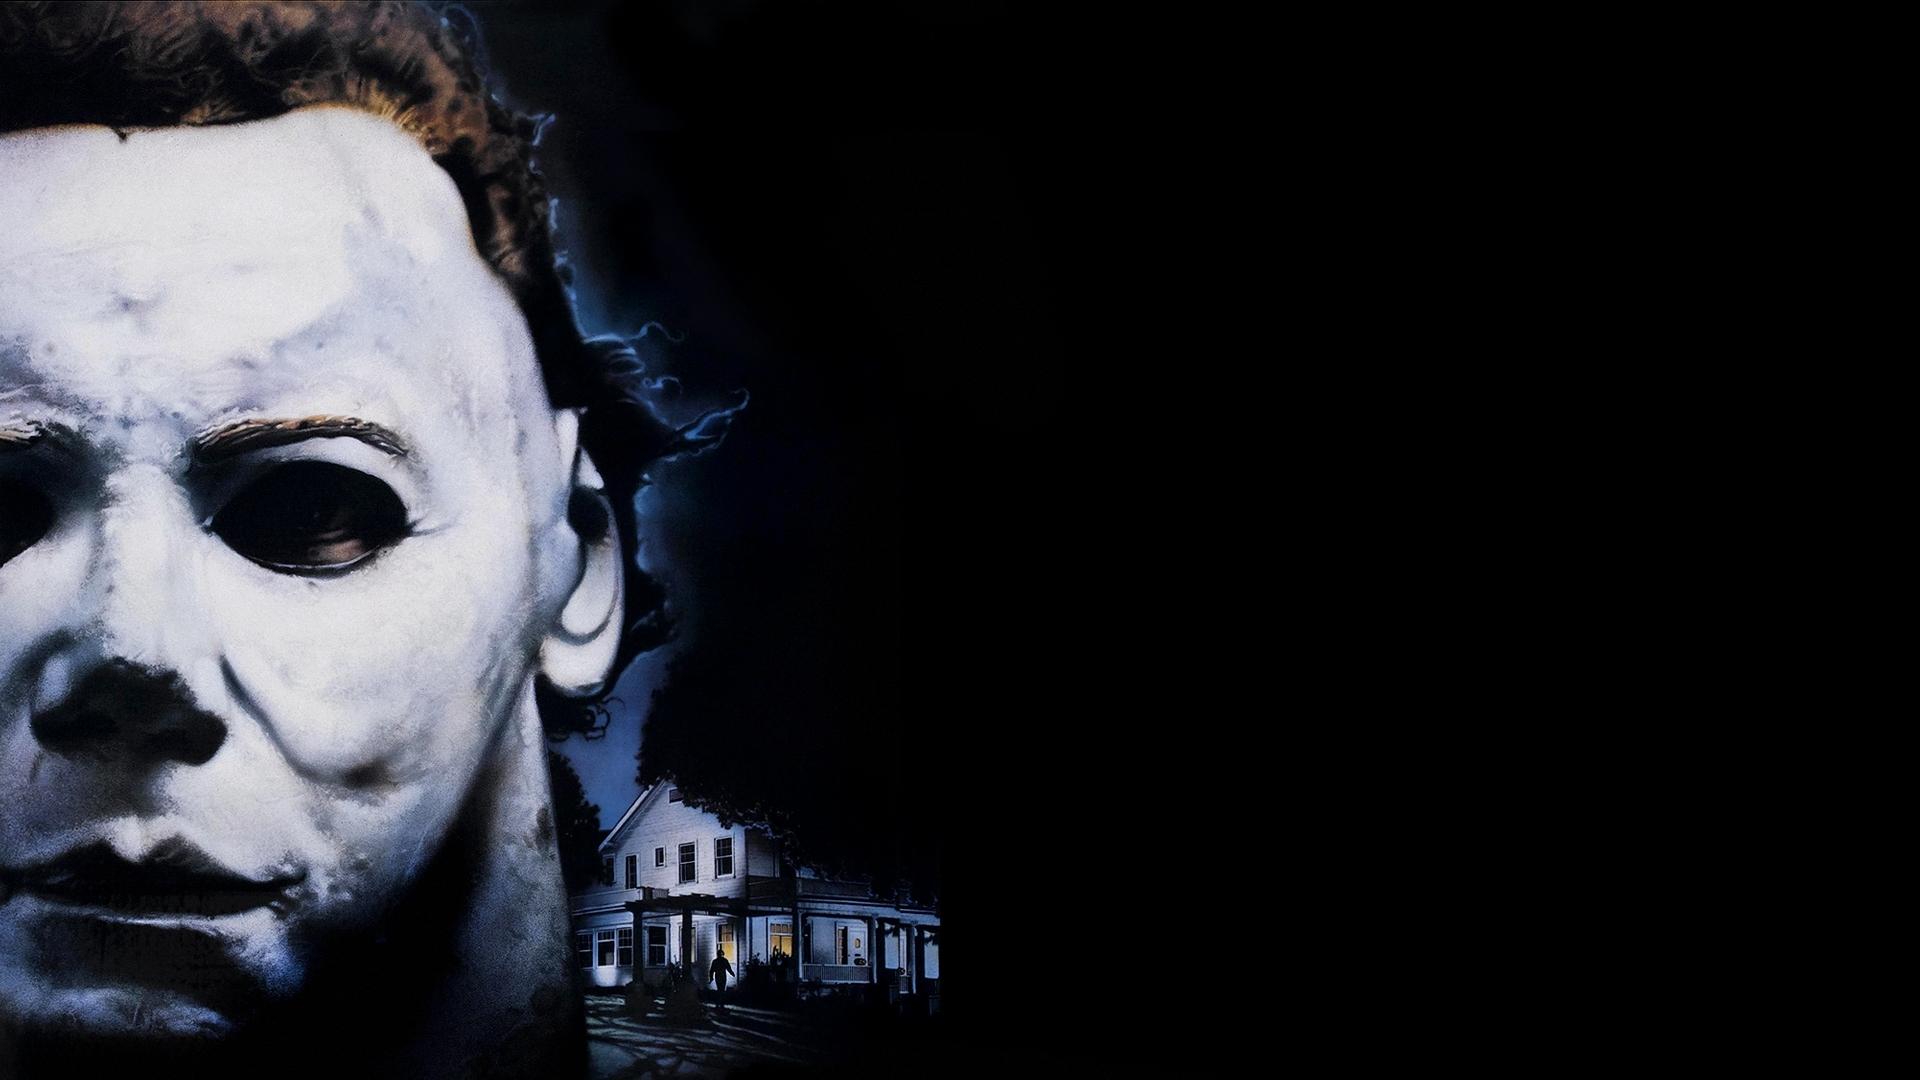 halloween 4: the return of michael myers full hd fond d'écran and